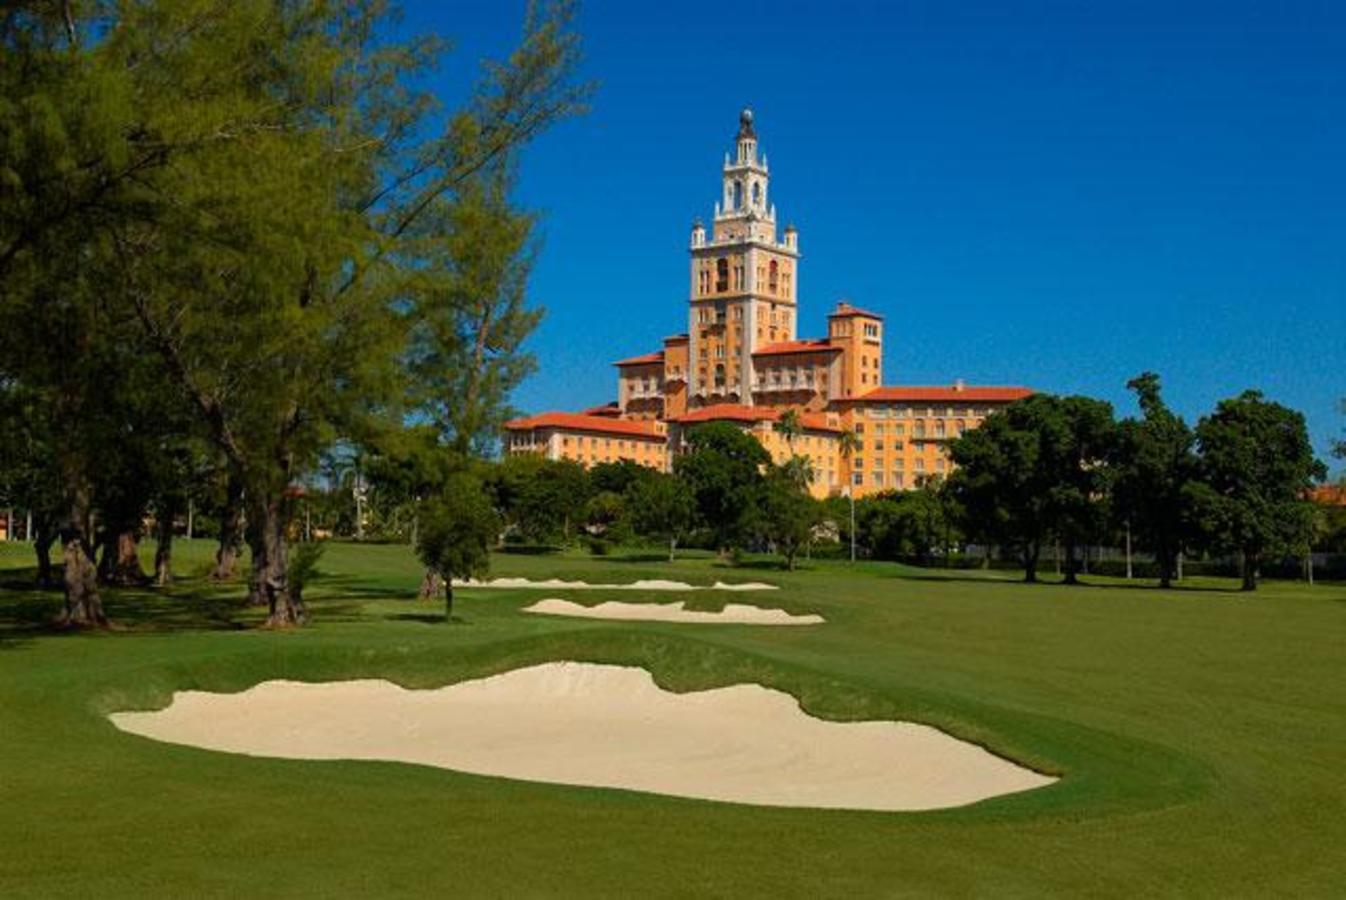 The Biltmore Golf Club